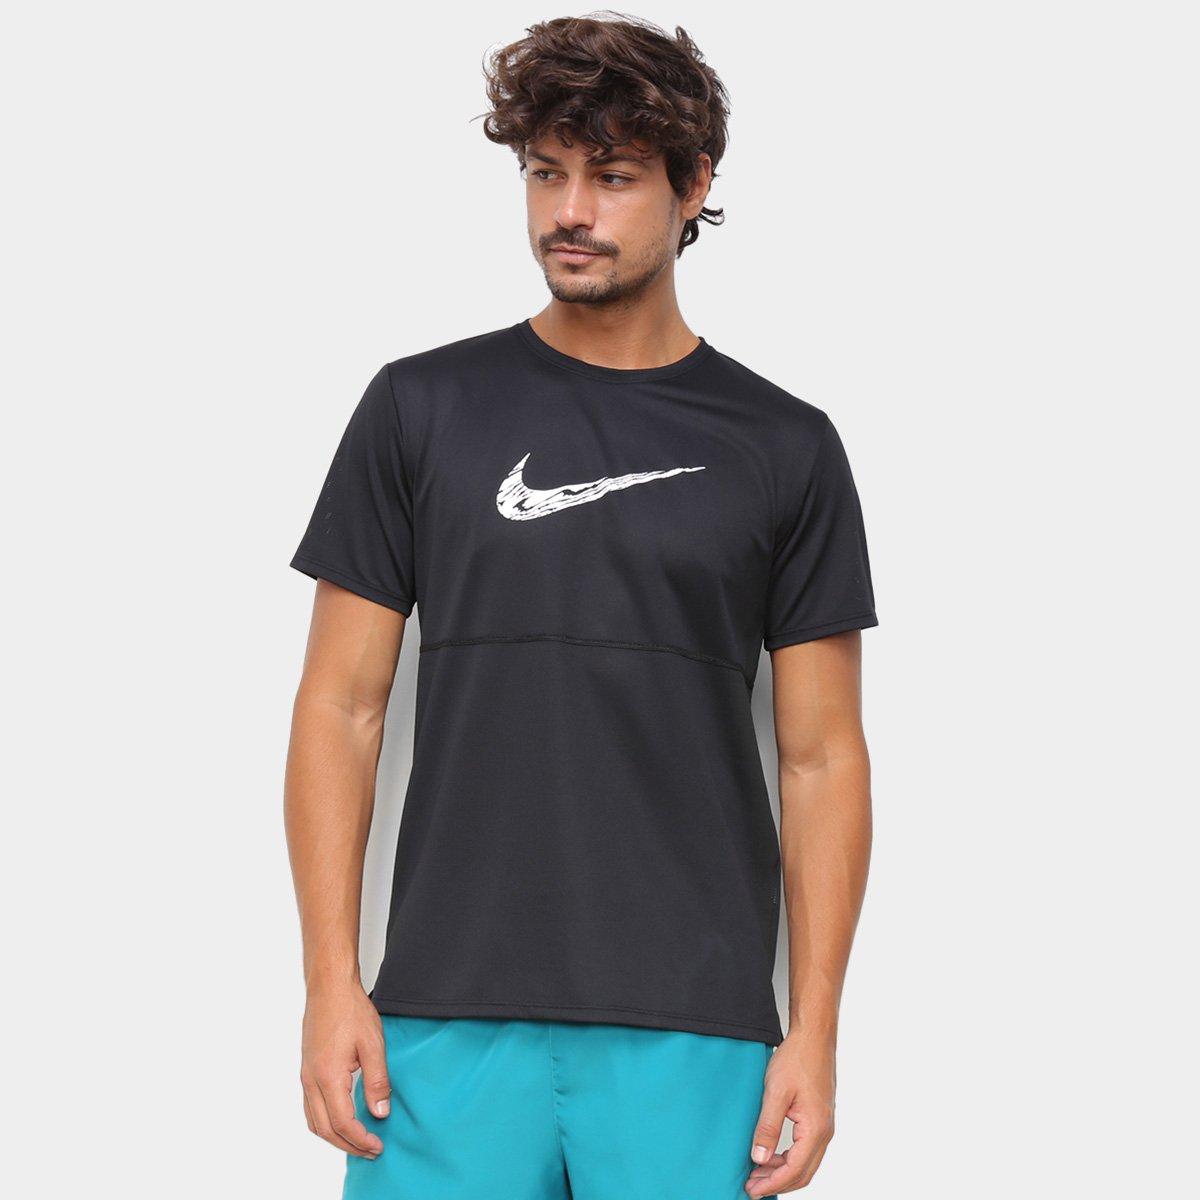 Camiseta Nike Breathe Run Masculina